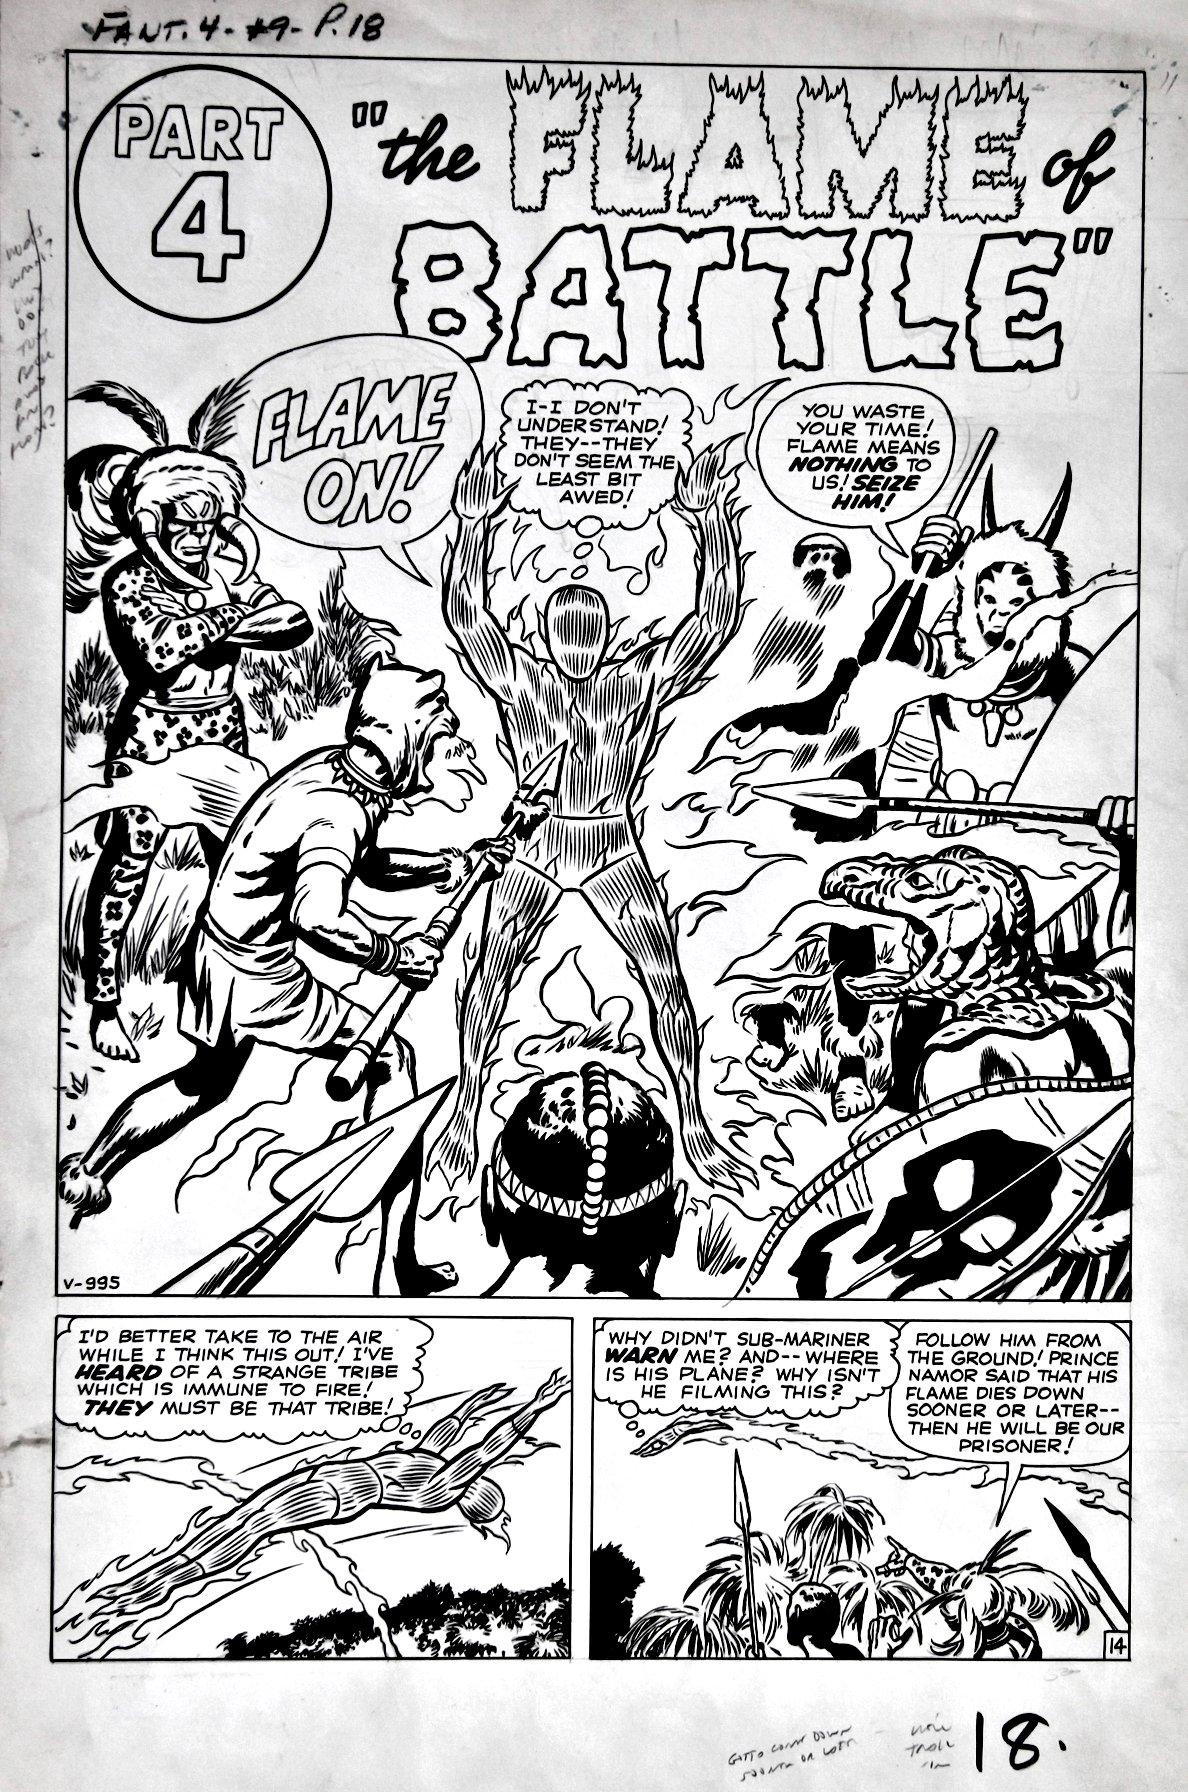 Fantastic Four #9 p 14 SPLASH (LARGE ART) 1962